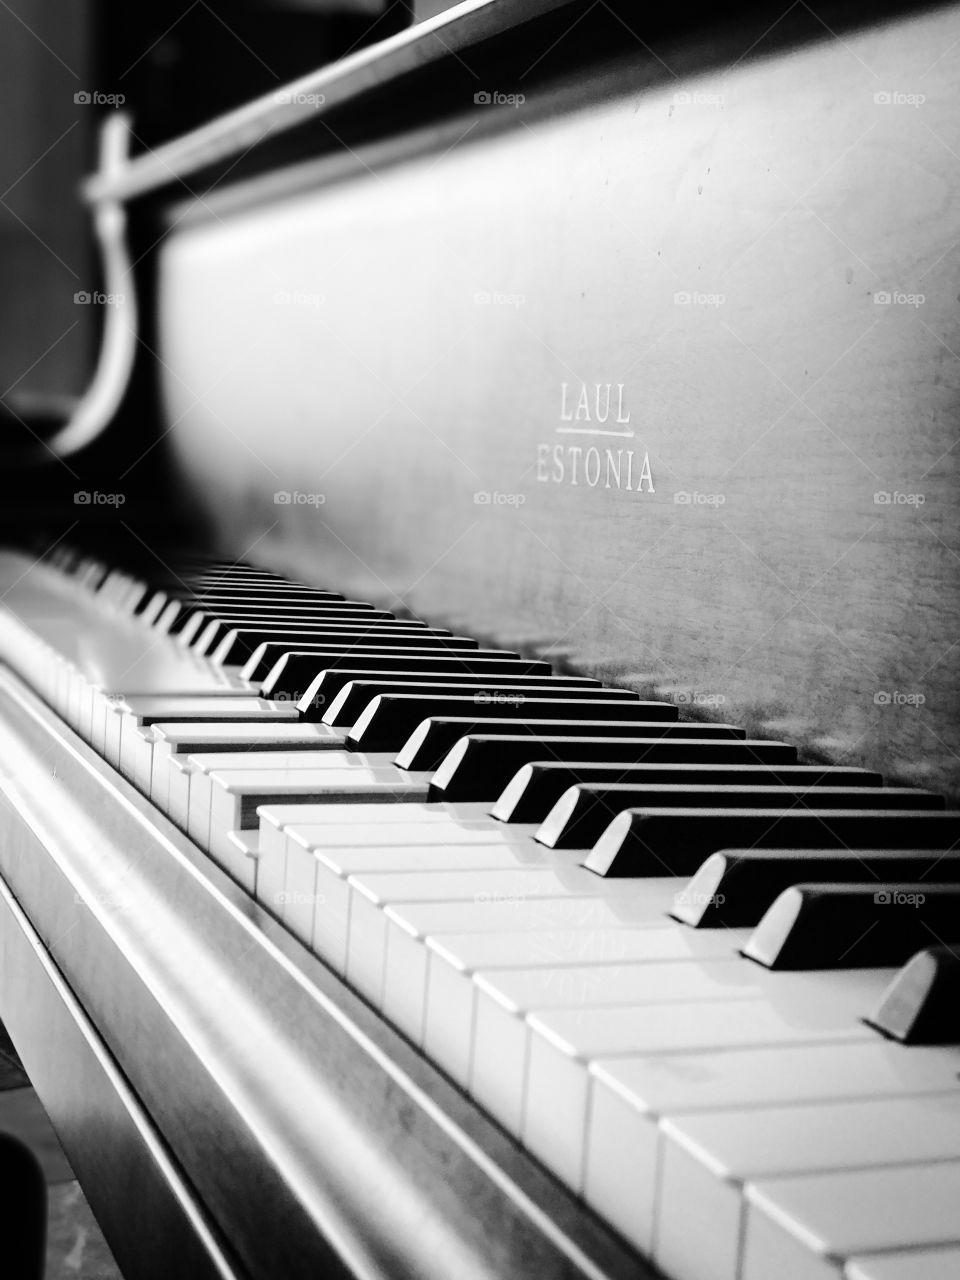 Close-up of a piano